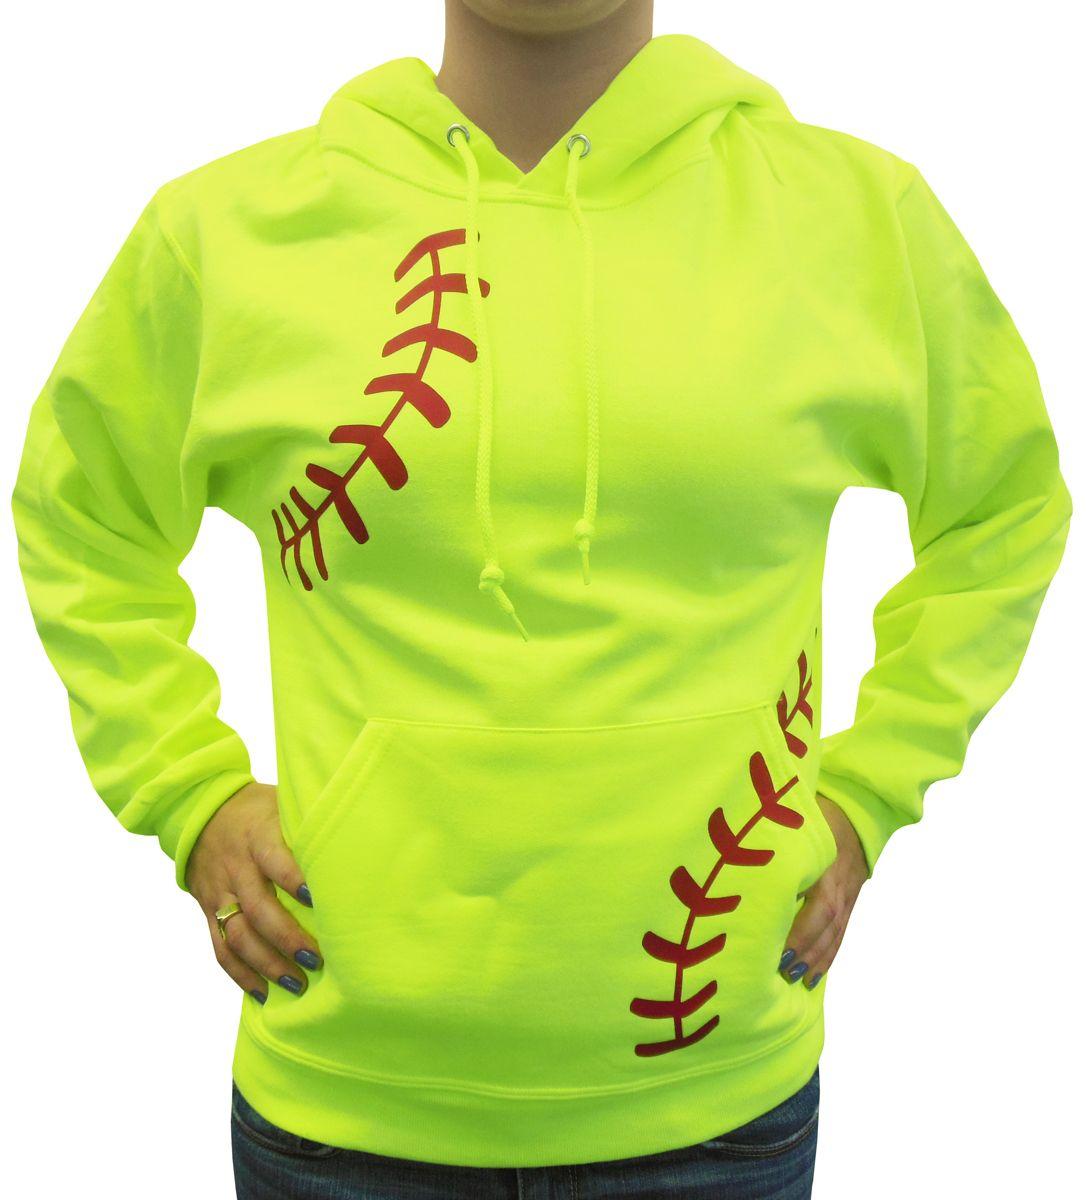 Shirt design with laces - Lace Design